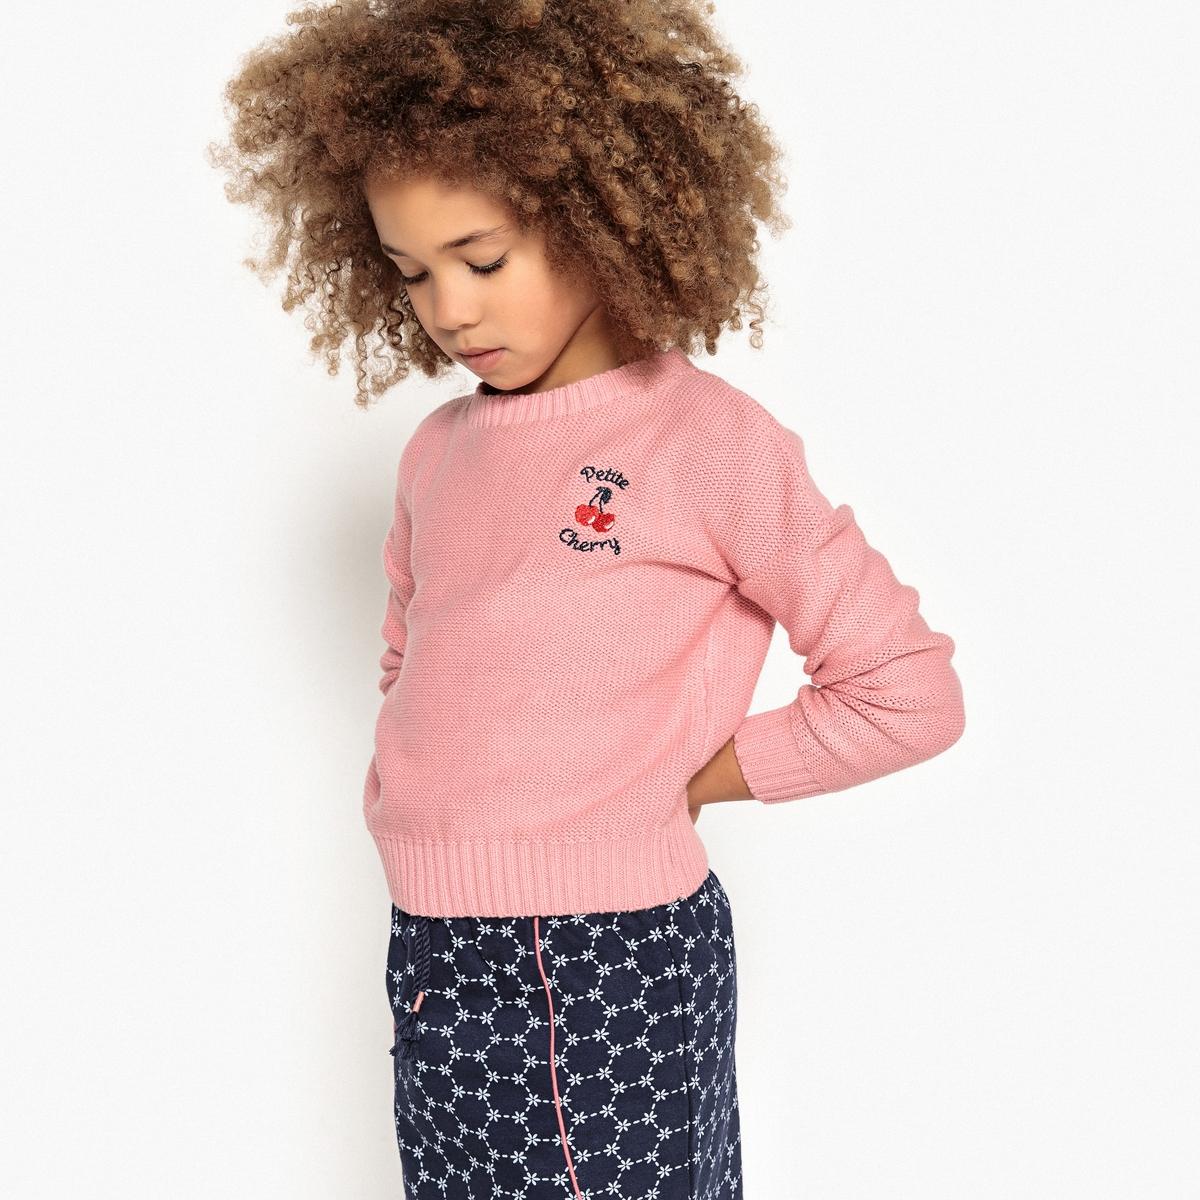 Пуловер с вышивкой petite cherry 3-12 лет